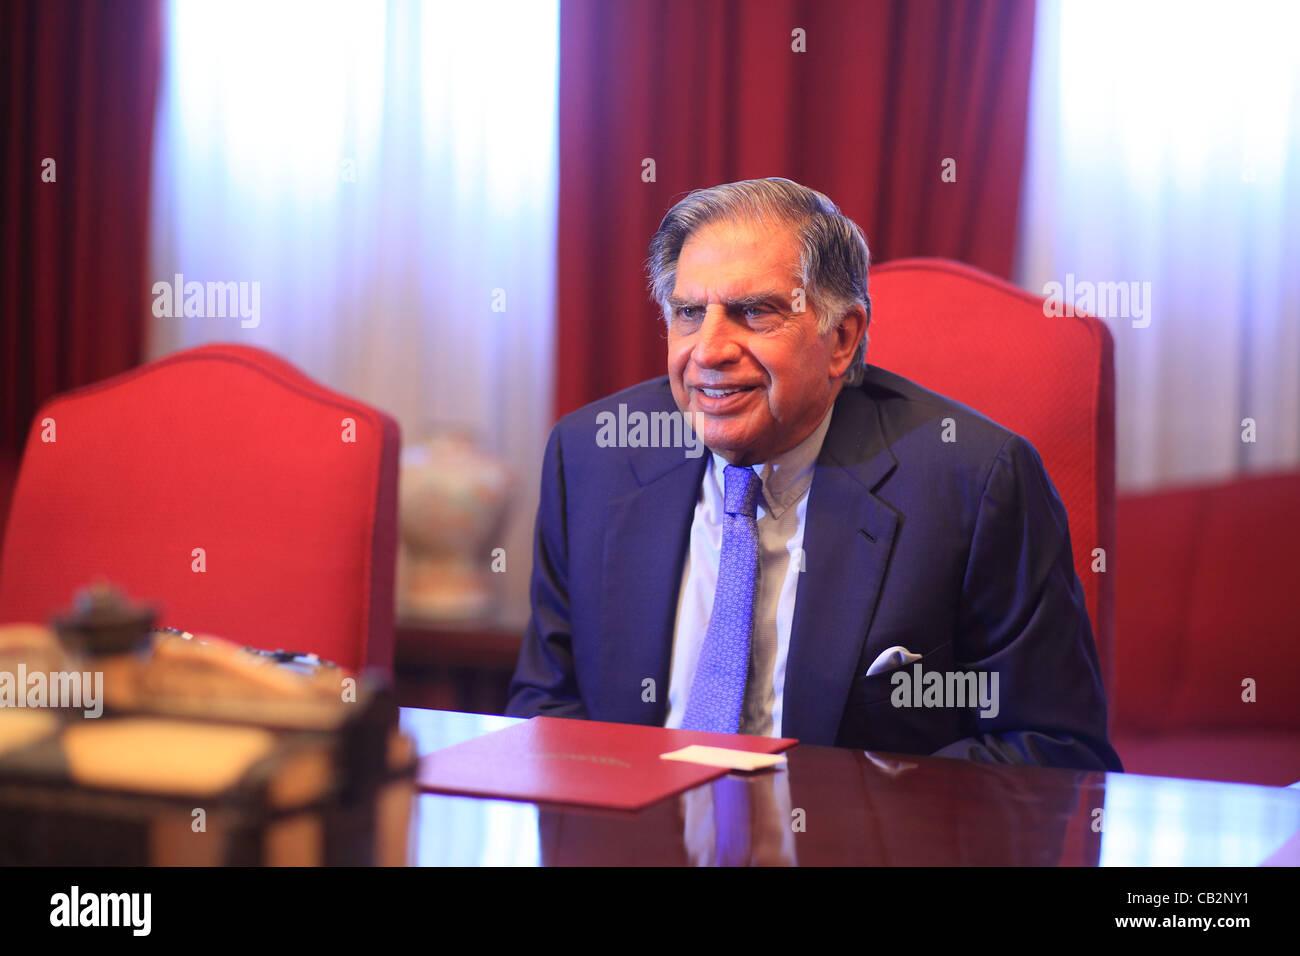 May16,2012 - Mumbai, India :   Portrait of Indian industrialist Rata Tata, chairman of the Tata empire at the Bombay House, the Tata groups headquarters in Mumbai. (Subhash Sharma) Stock Photo